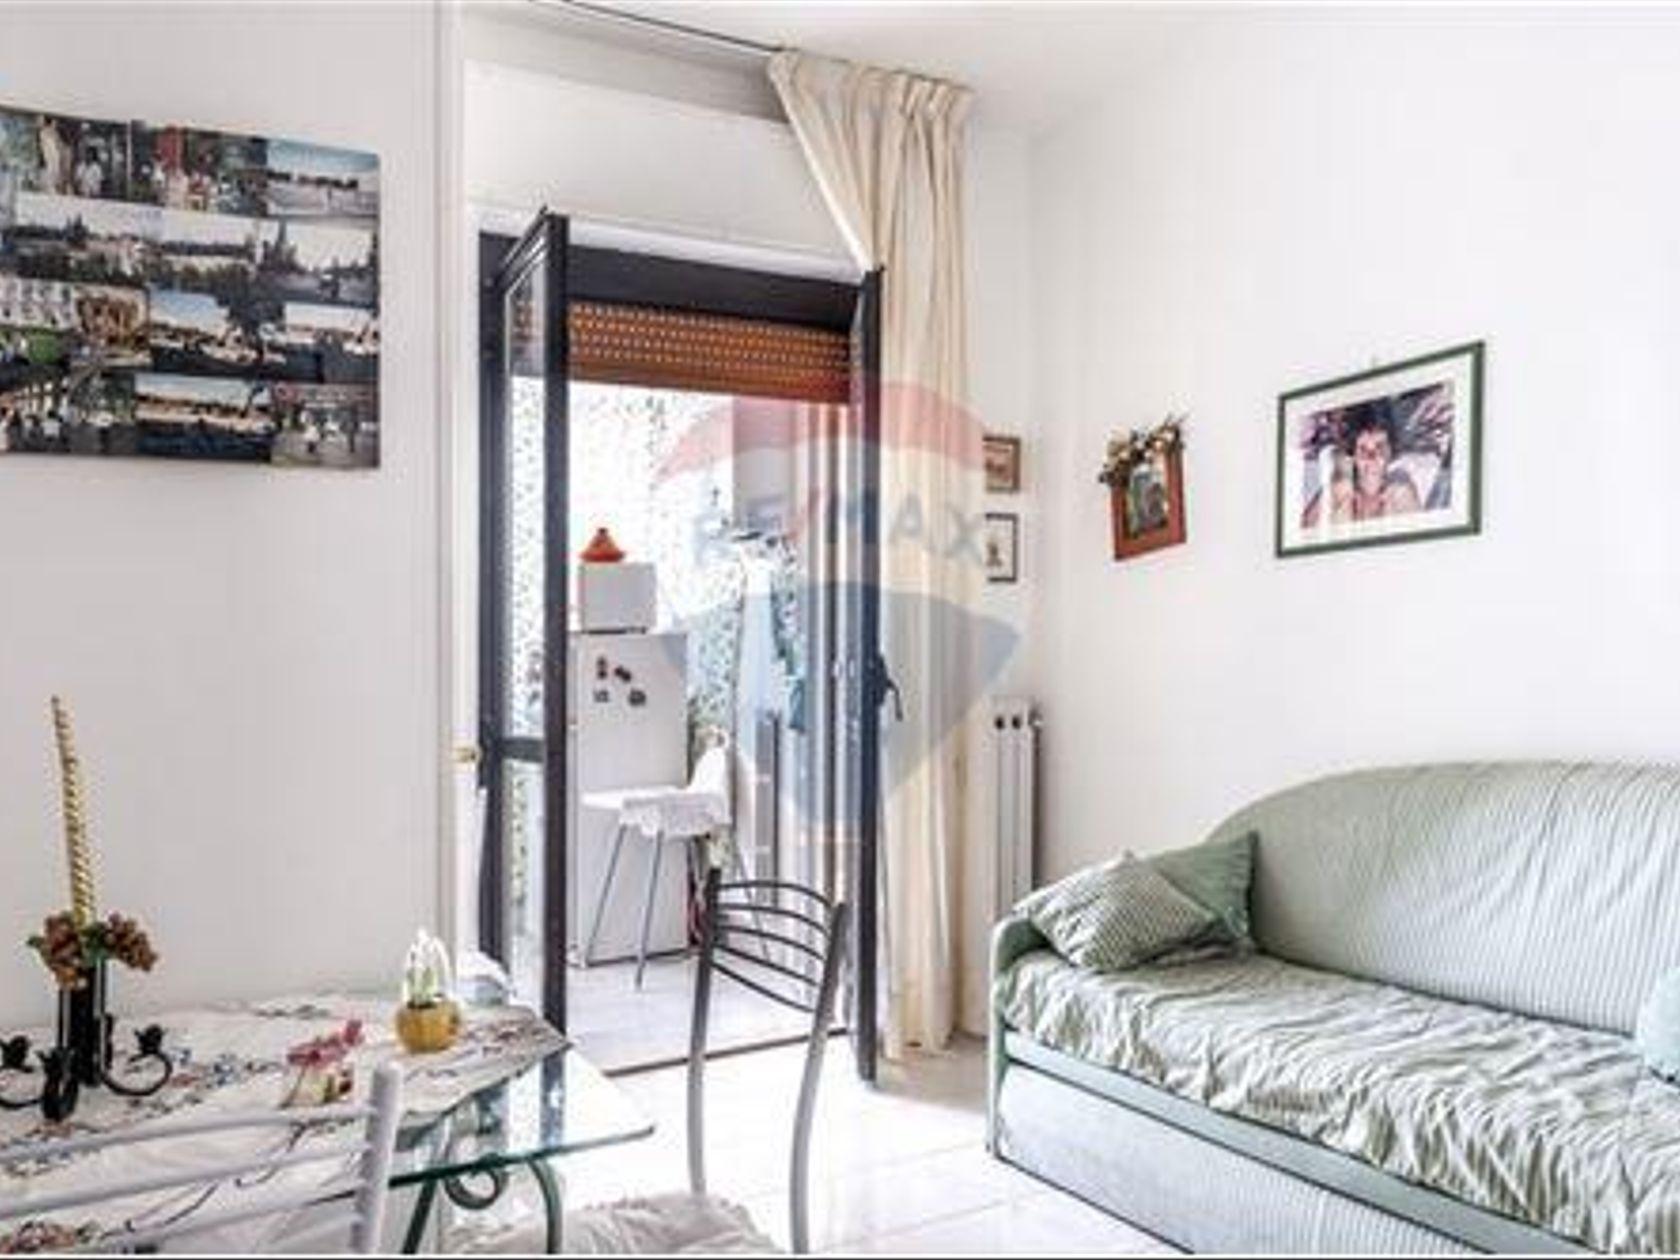 Appartamento Japigia, Bari, BA Vendita - Foto 6